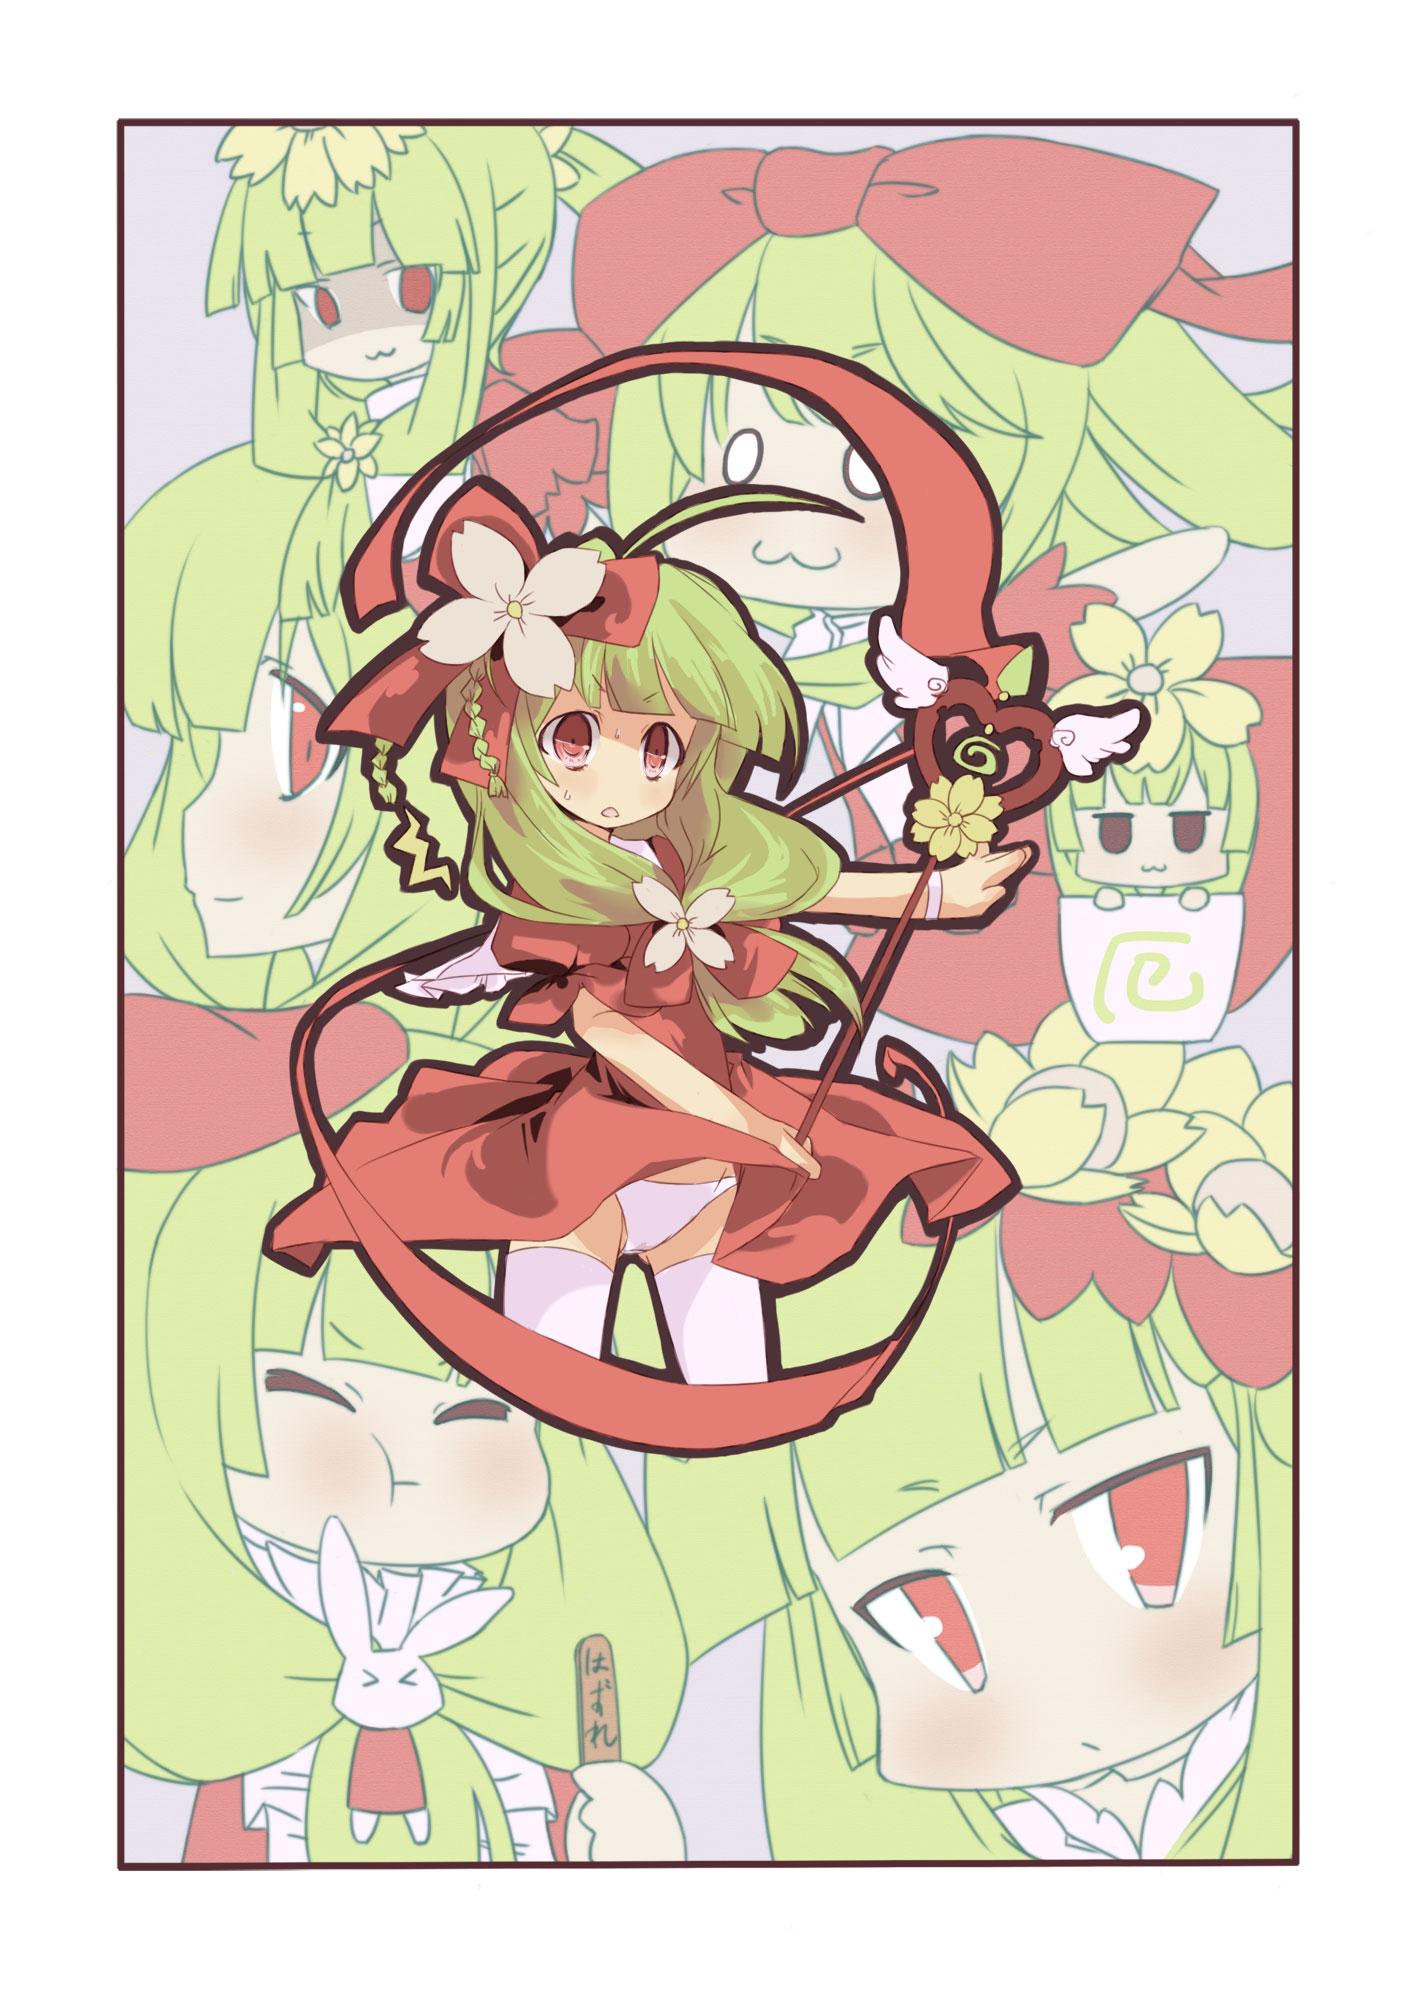 tsliuyixin anime artist girl picture аниме девочка